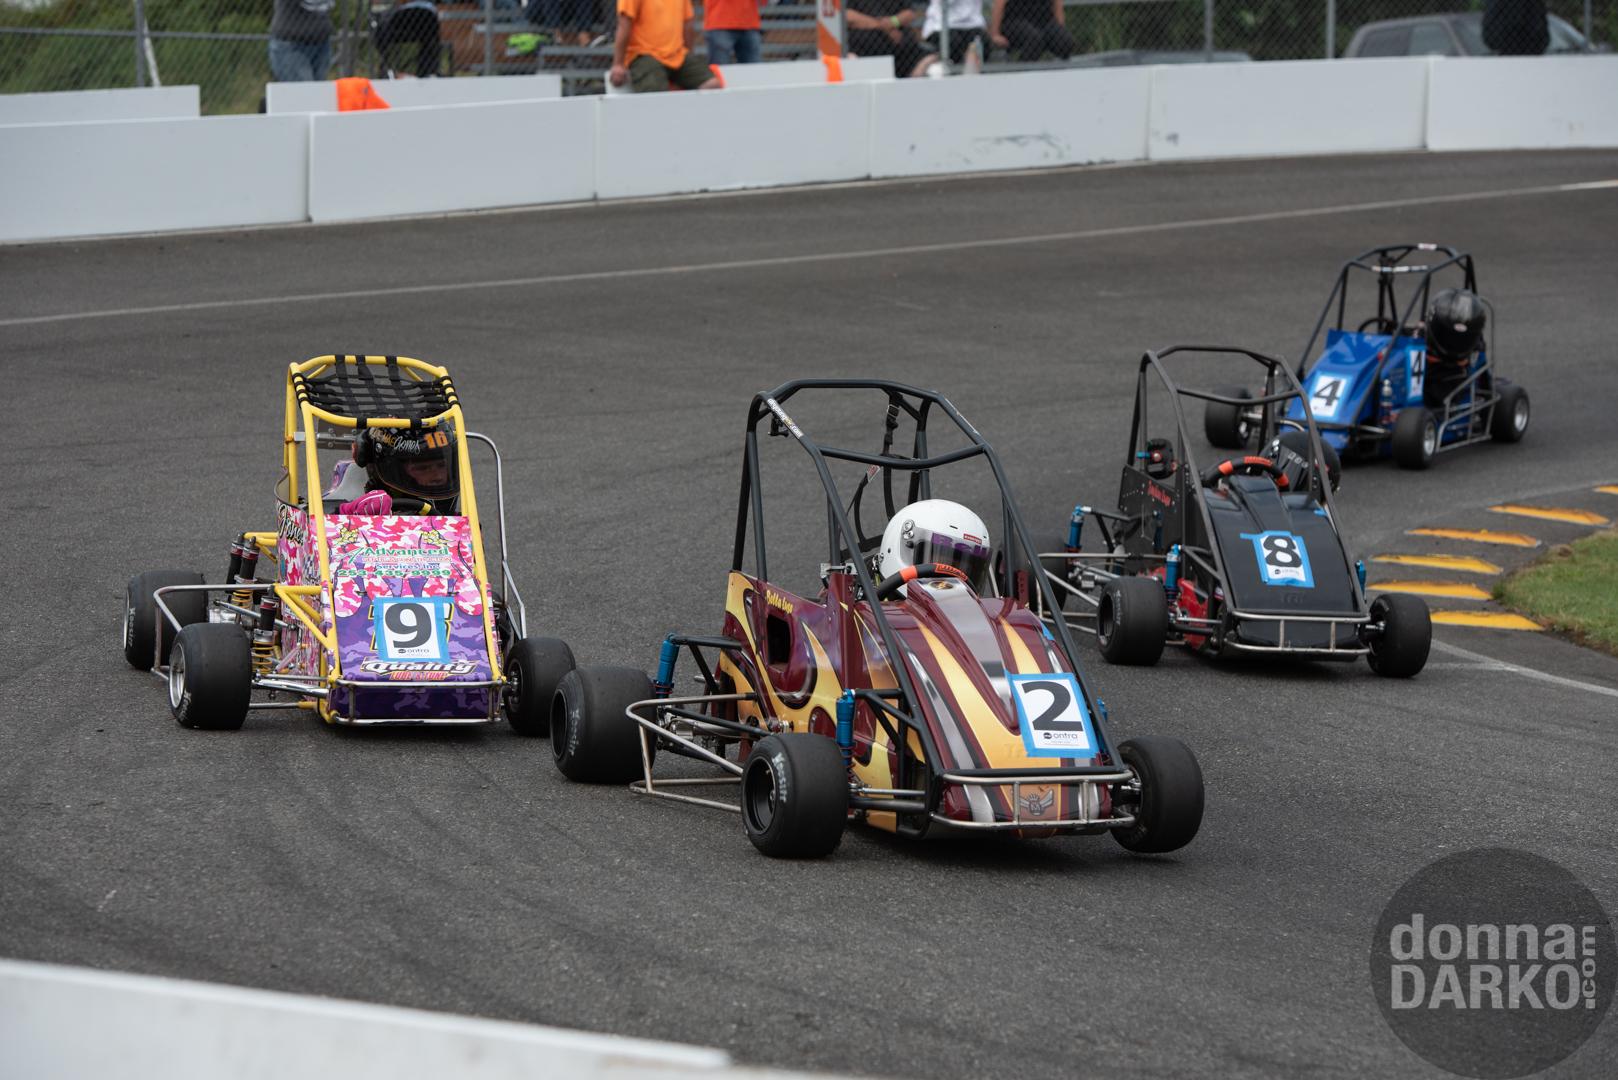 QWMA (Racing) 8-11-2019 DSC_7602.jpg